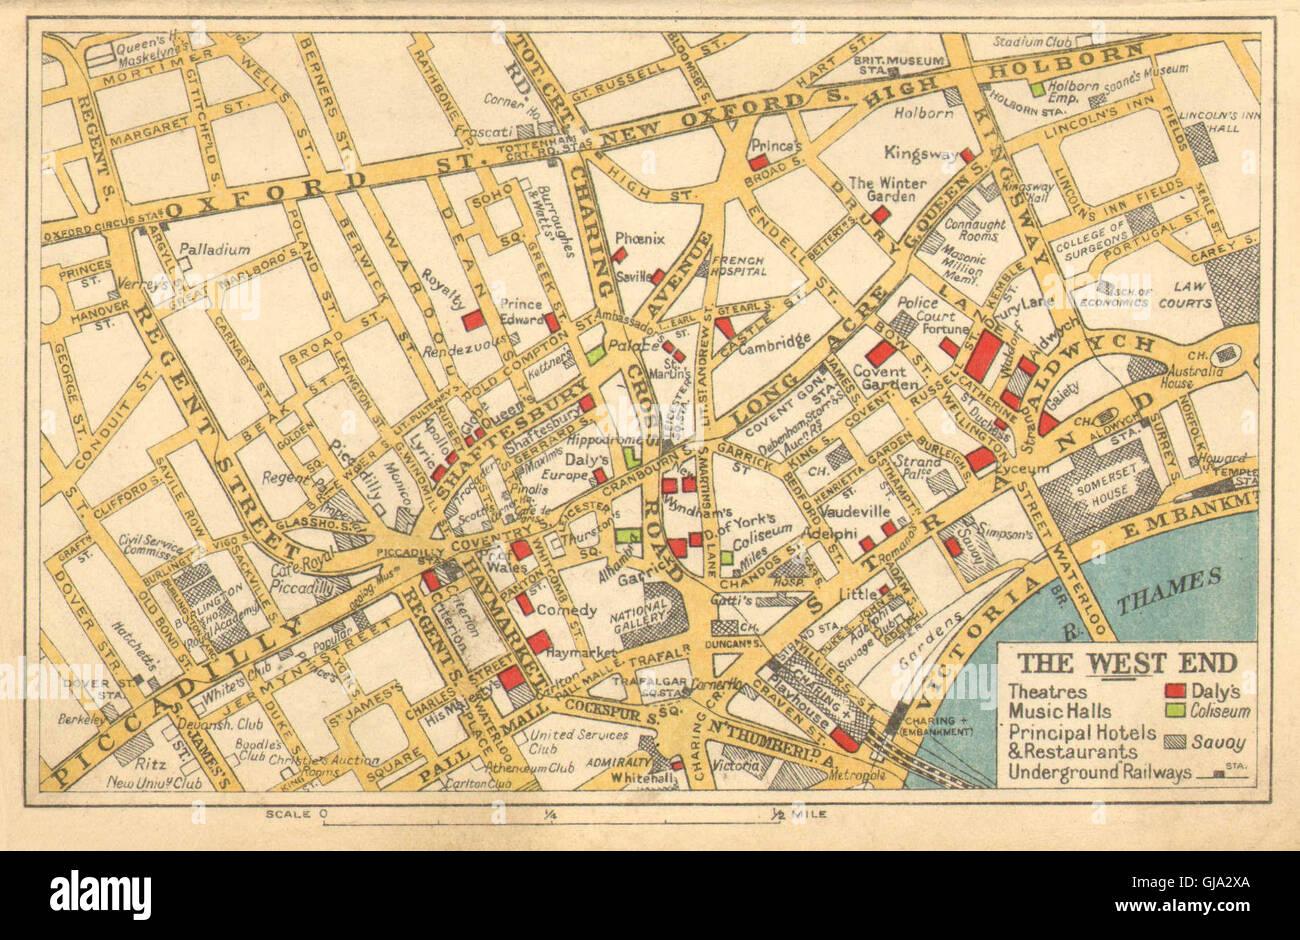 london west end theatres cinemas principal hotels restaurants bacon 1933 map